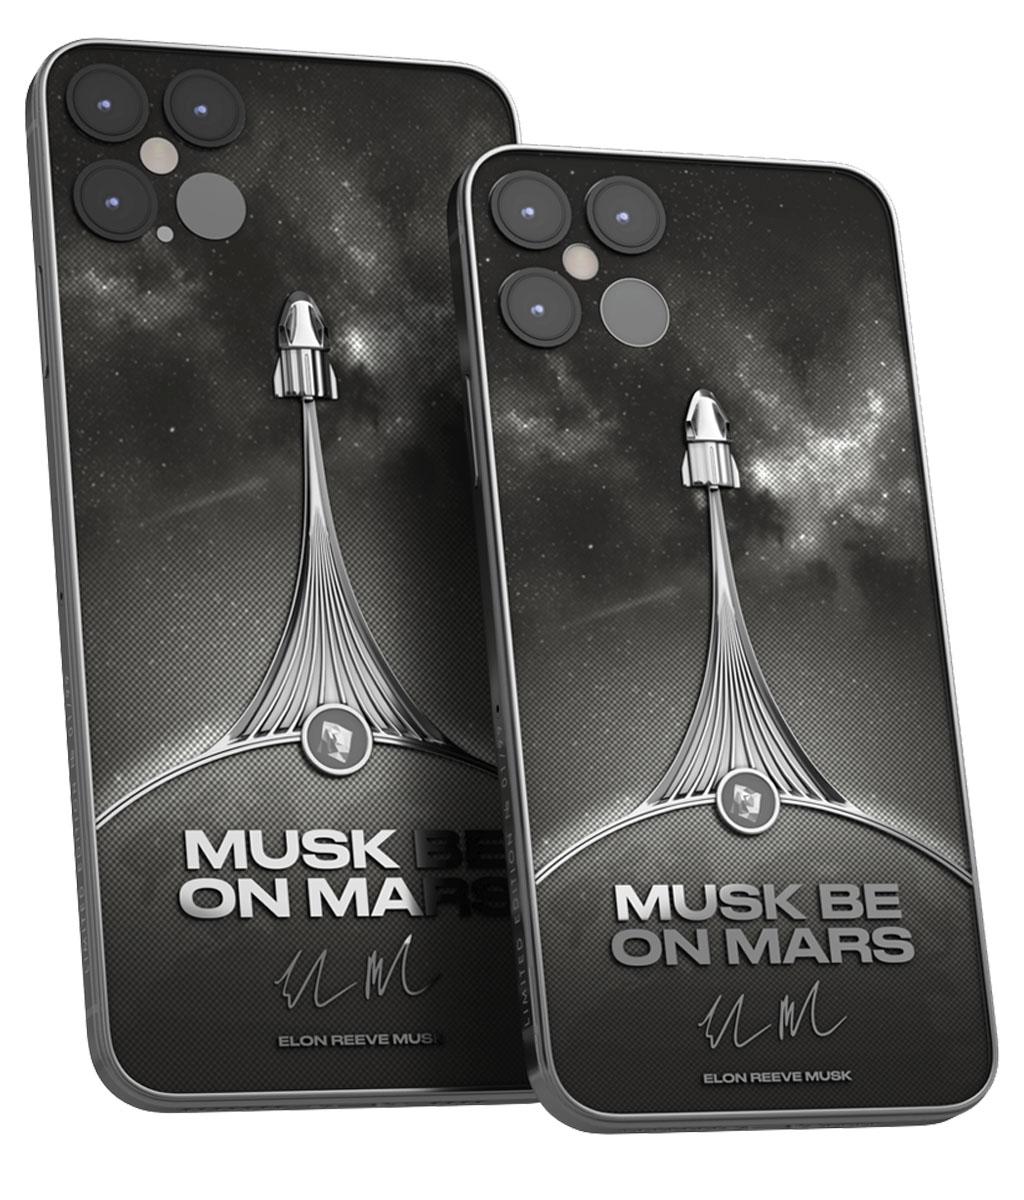 Тяжелый люкс от Илона Маска: уникальный смартфон iPhone 12 Pro Limited Edition Musk be on Mars скоро увидит свет